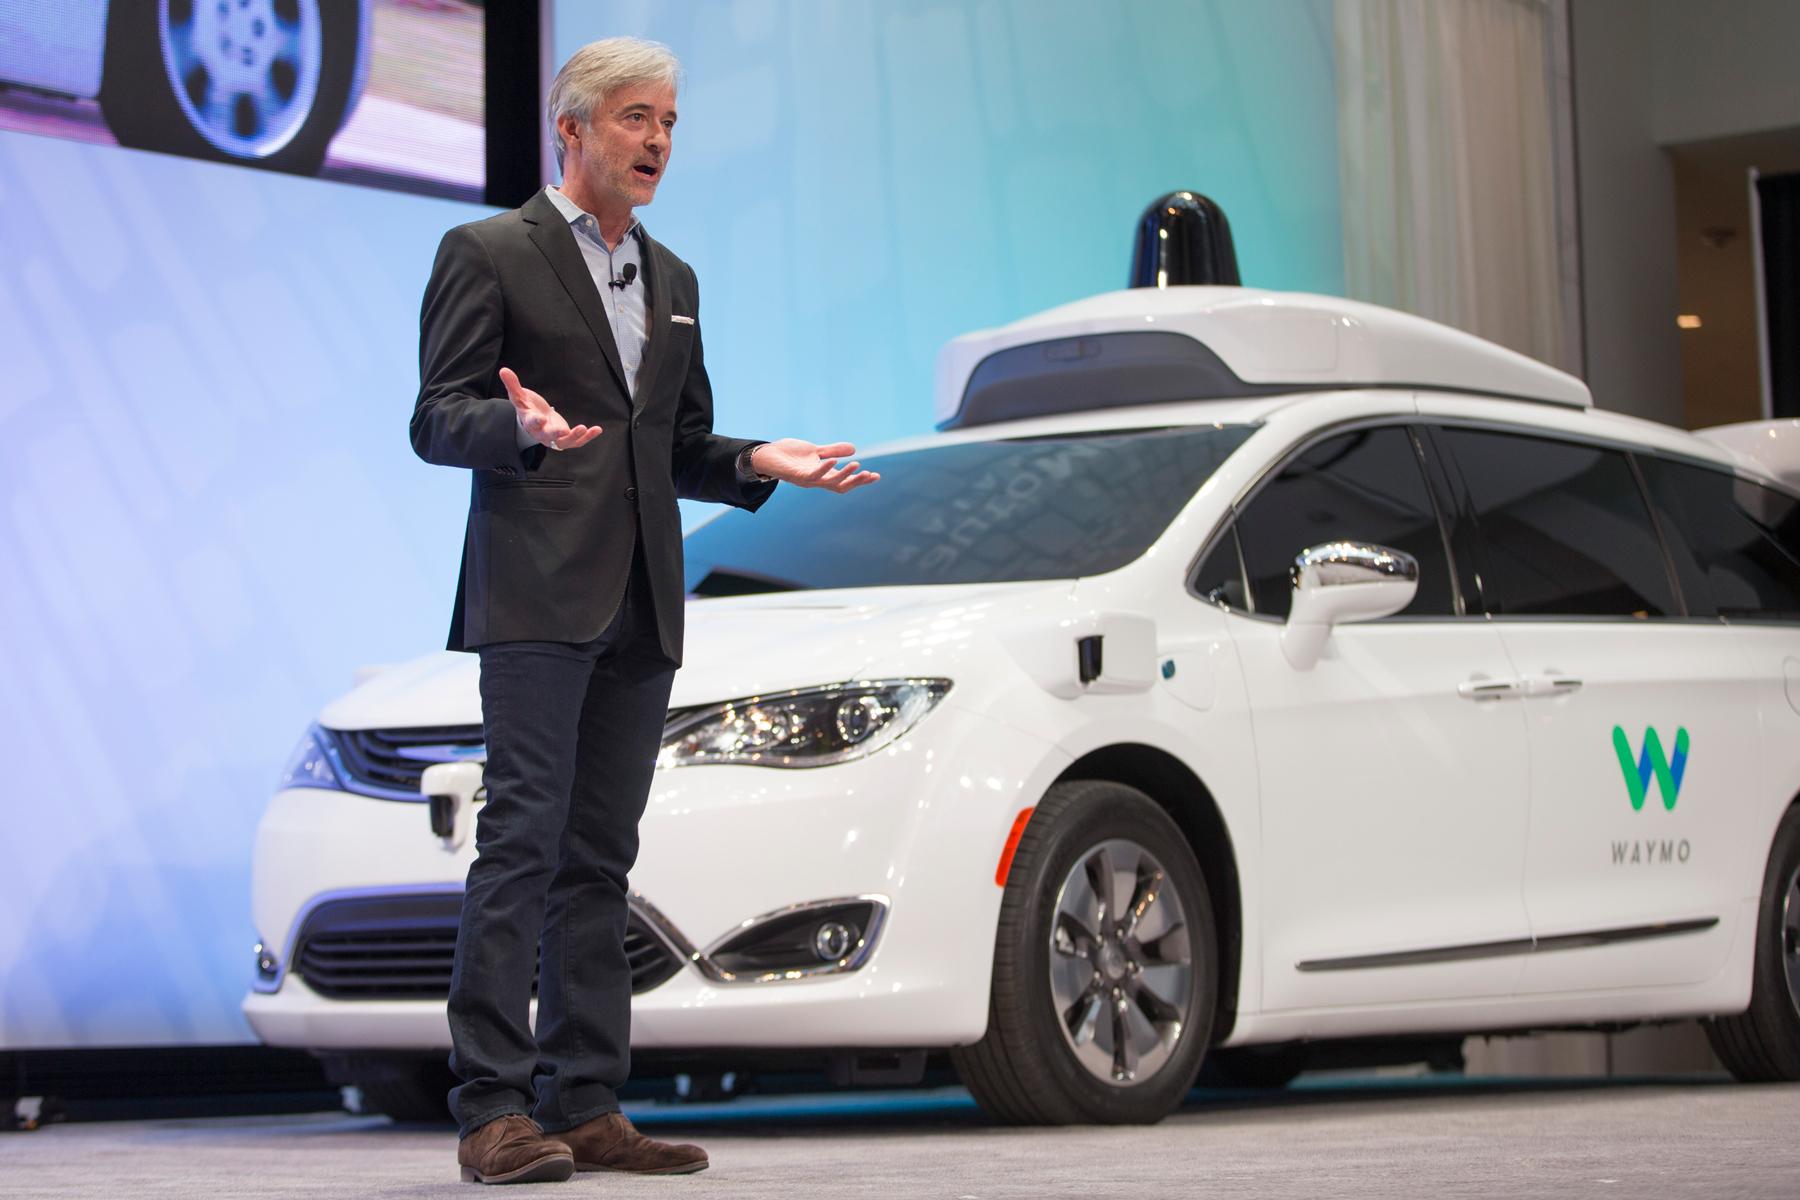 Waymo's CEO, John Krafcik, doesn't want his cars to be hacked.